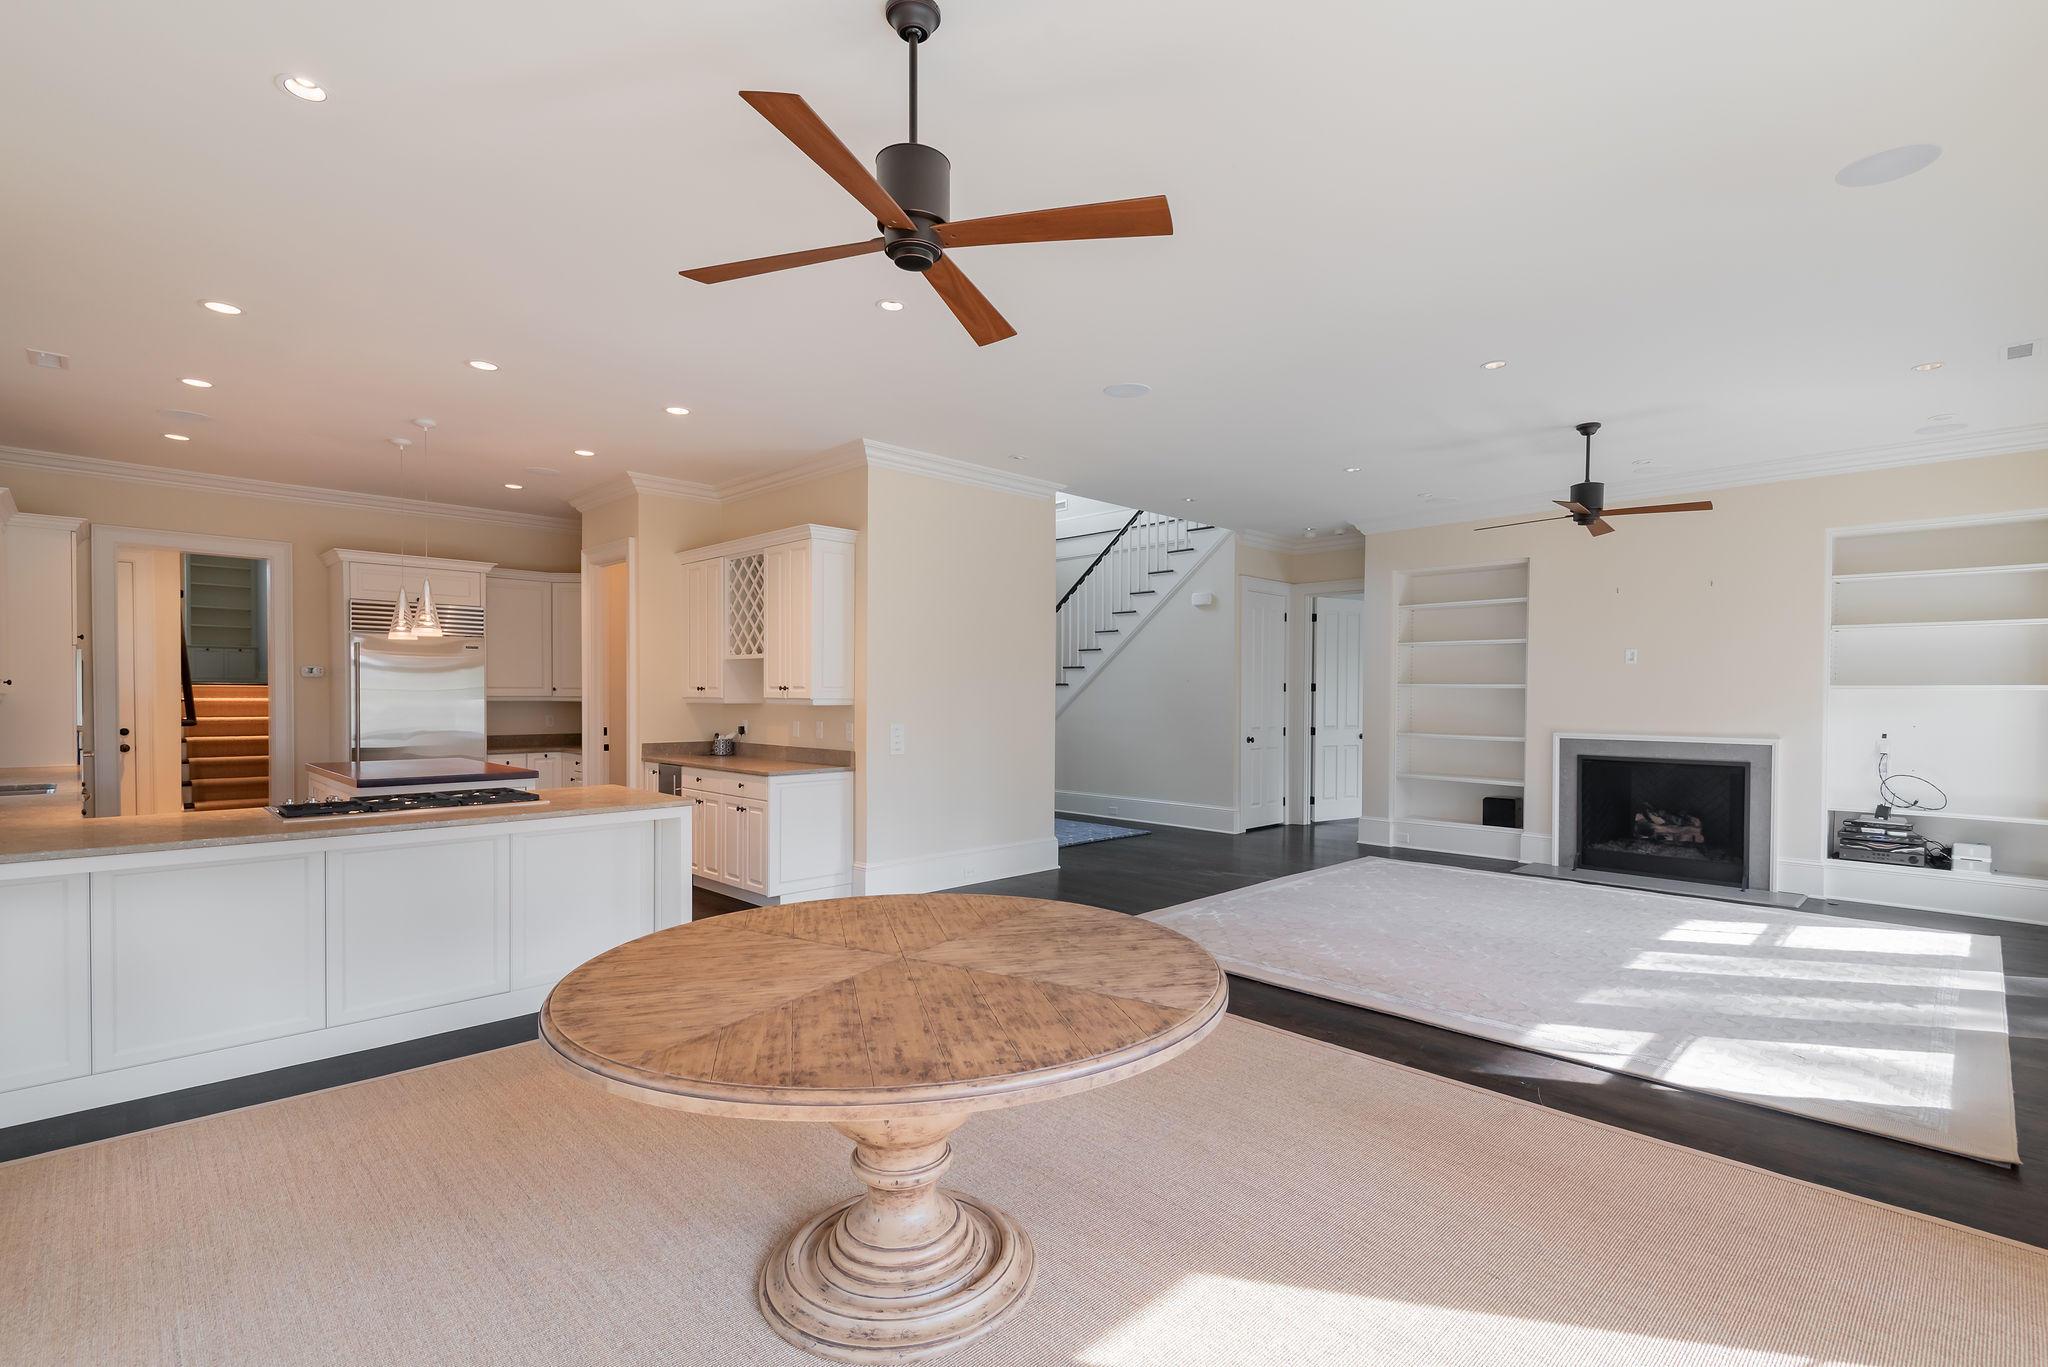 Kiawah Island Homes For Sale - 3 Grey Widgeon, Kiawah Island, SC - 46